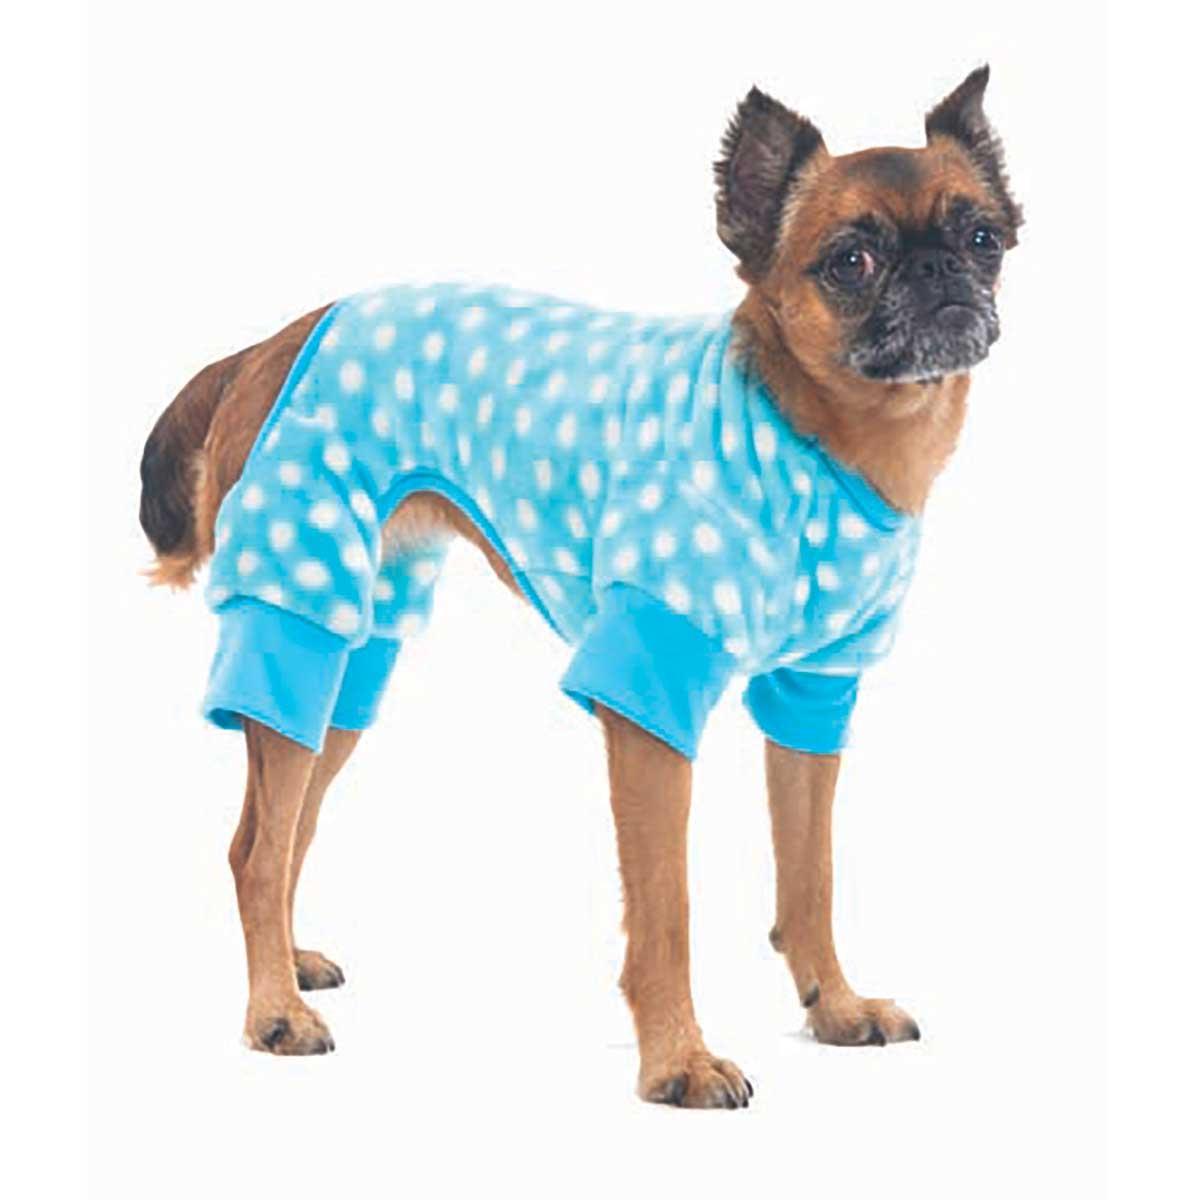 Blue Cozy Fleece Sleeper Dog Onesie - Sizes X Small - Medium